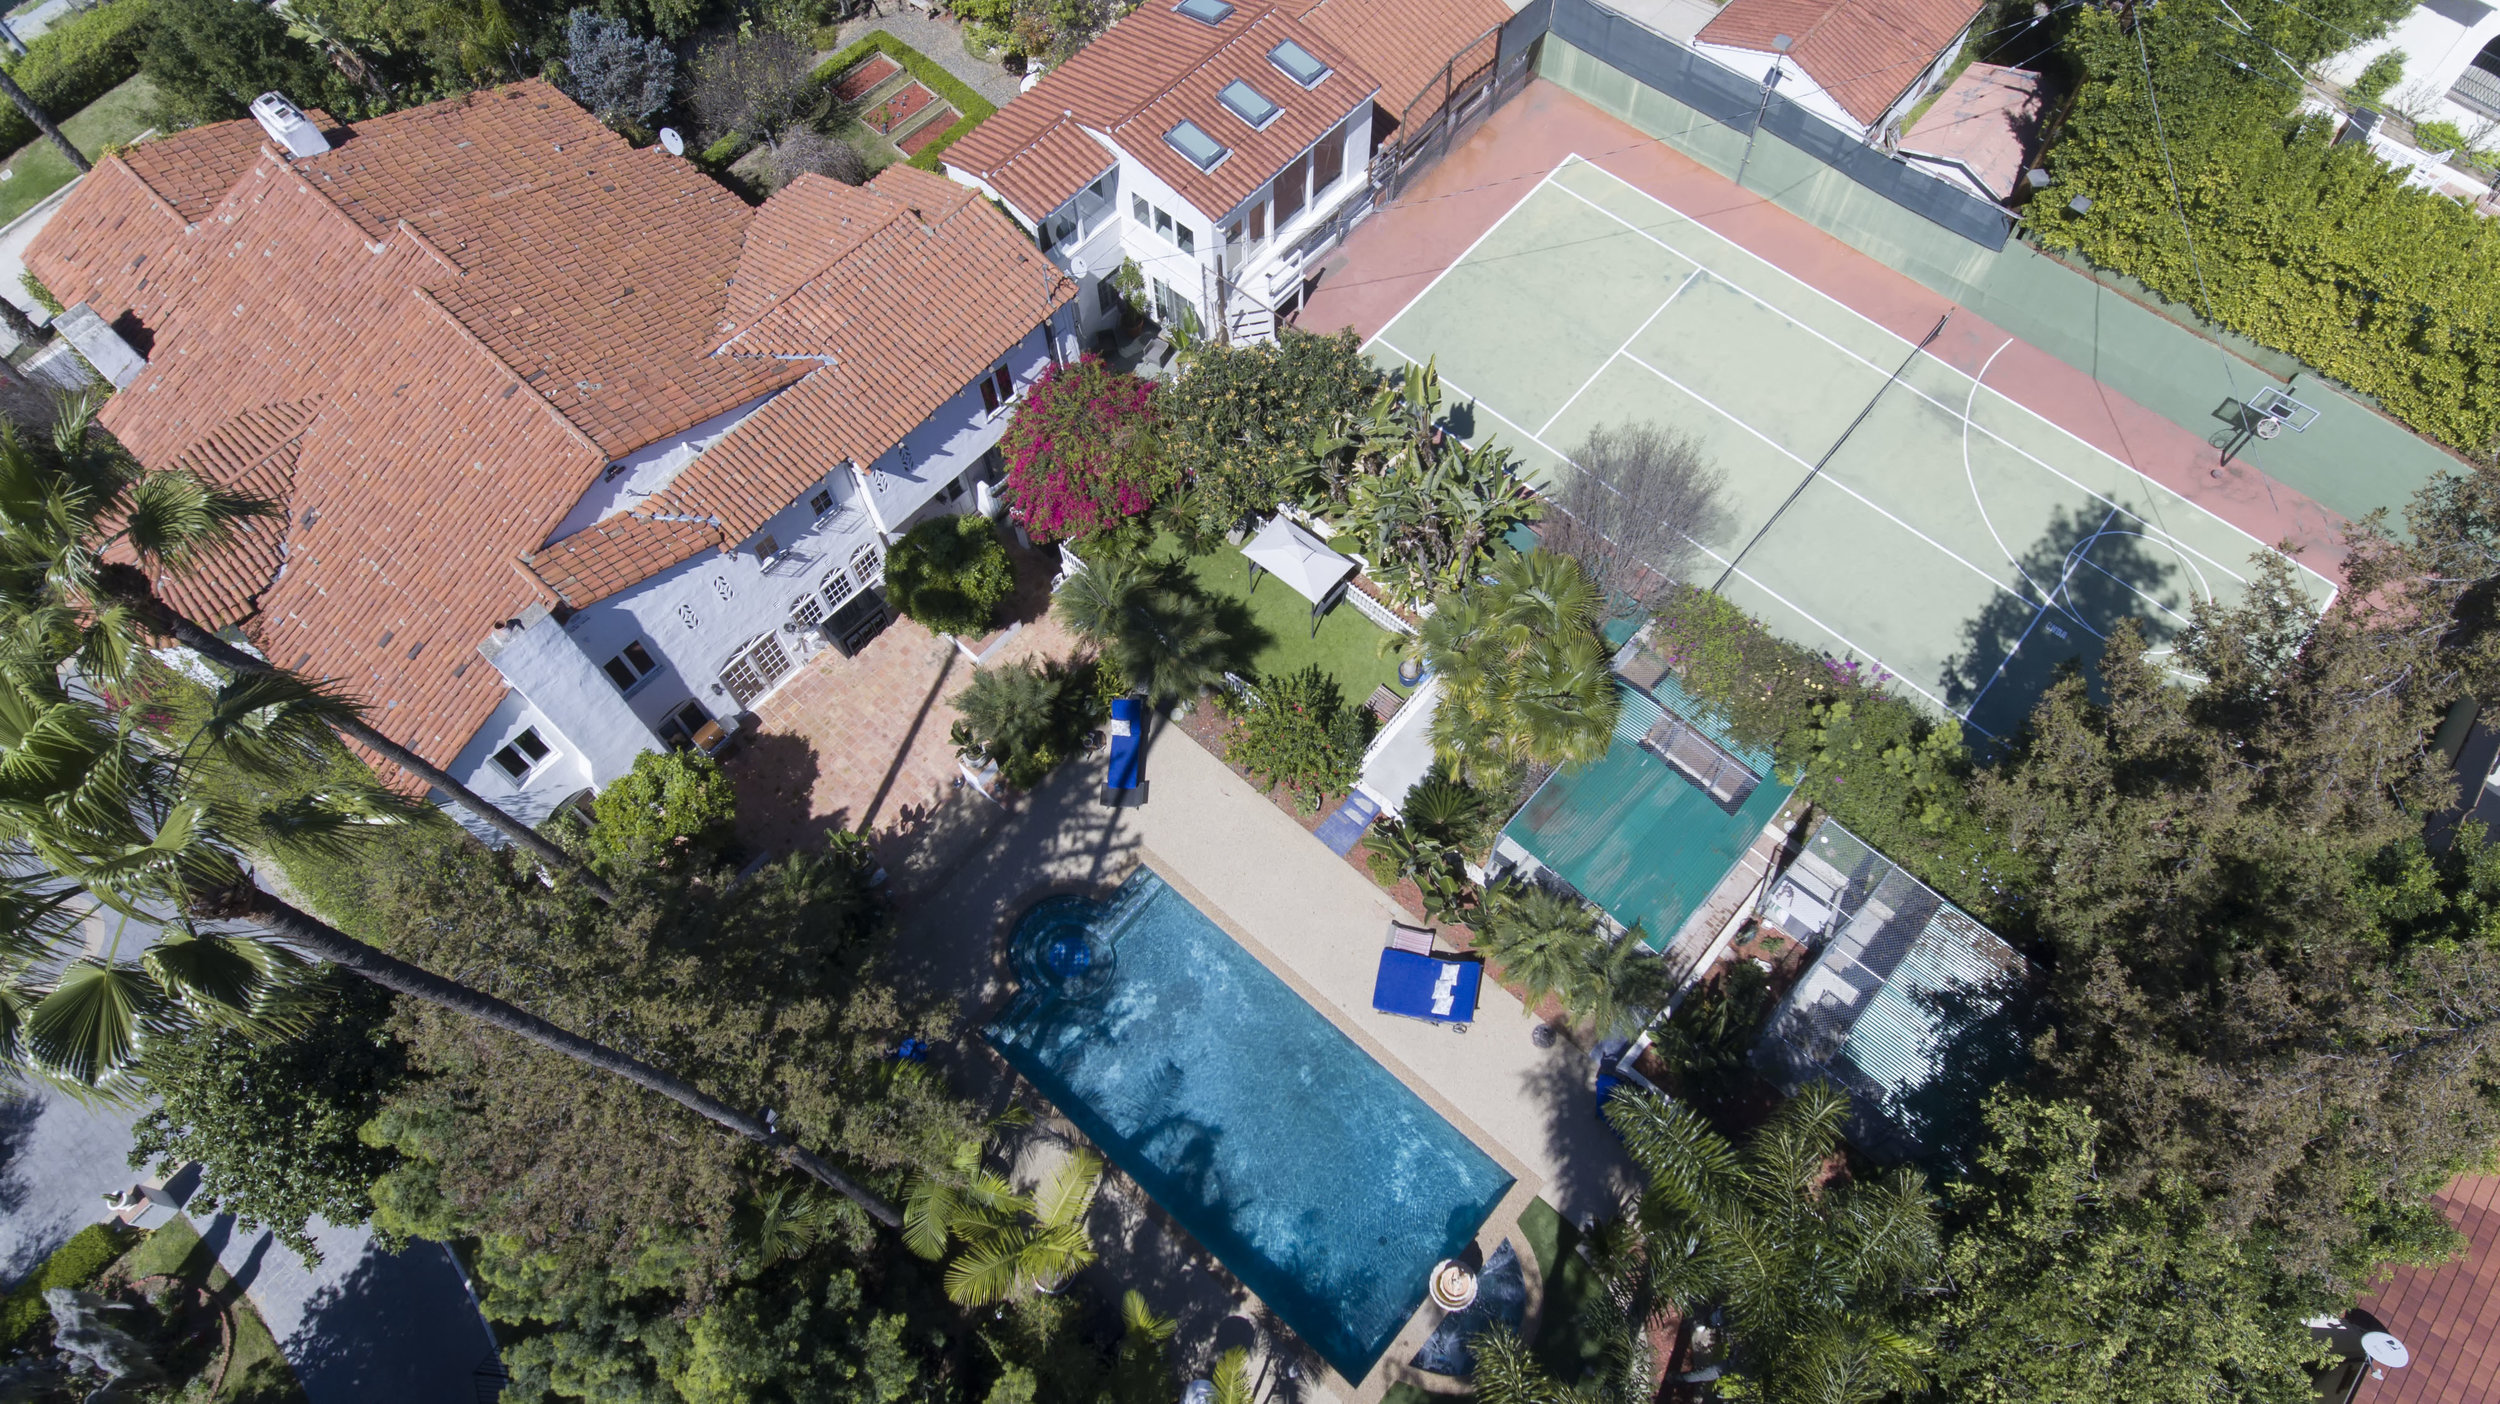 006 Aerial 006 Pool 4915 Los Feliz For Sale Los Angeles Lease The Malibu Life Team Luxury Real Estate.jpg